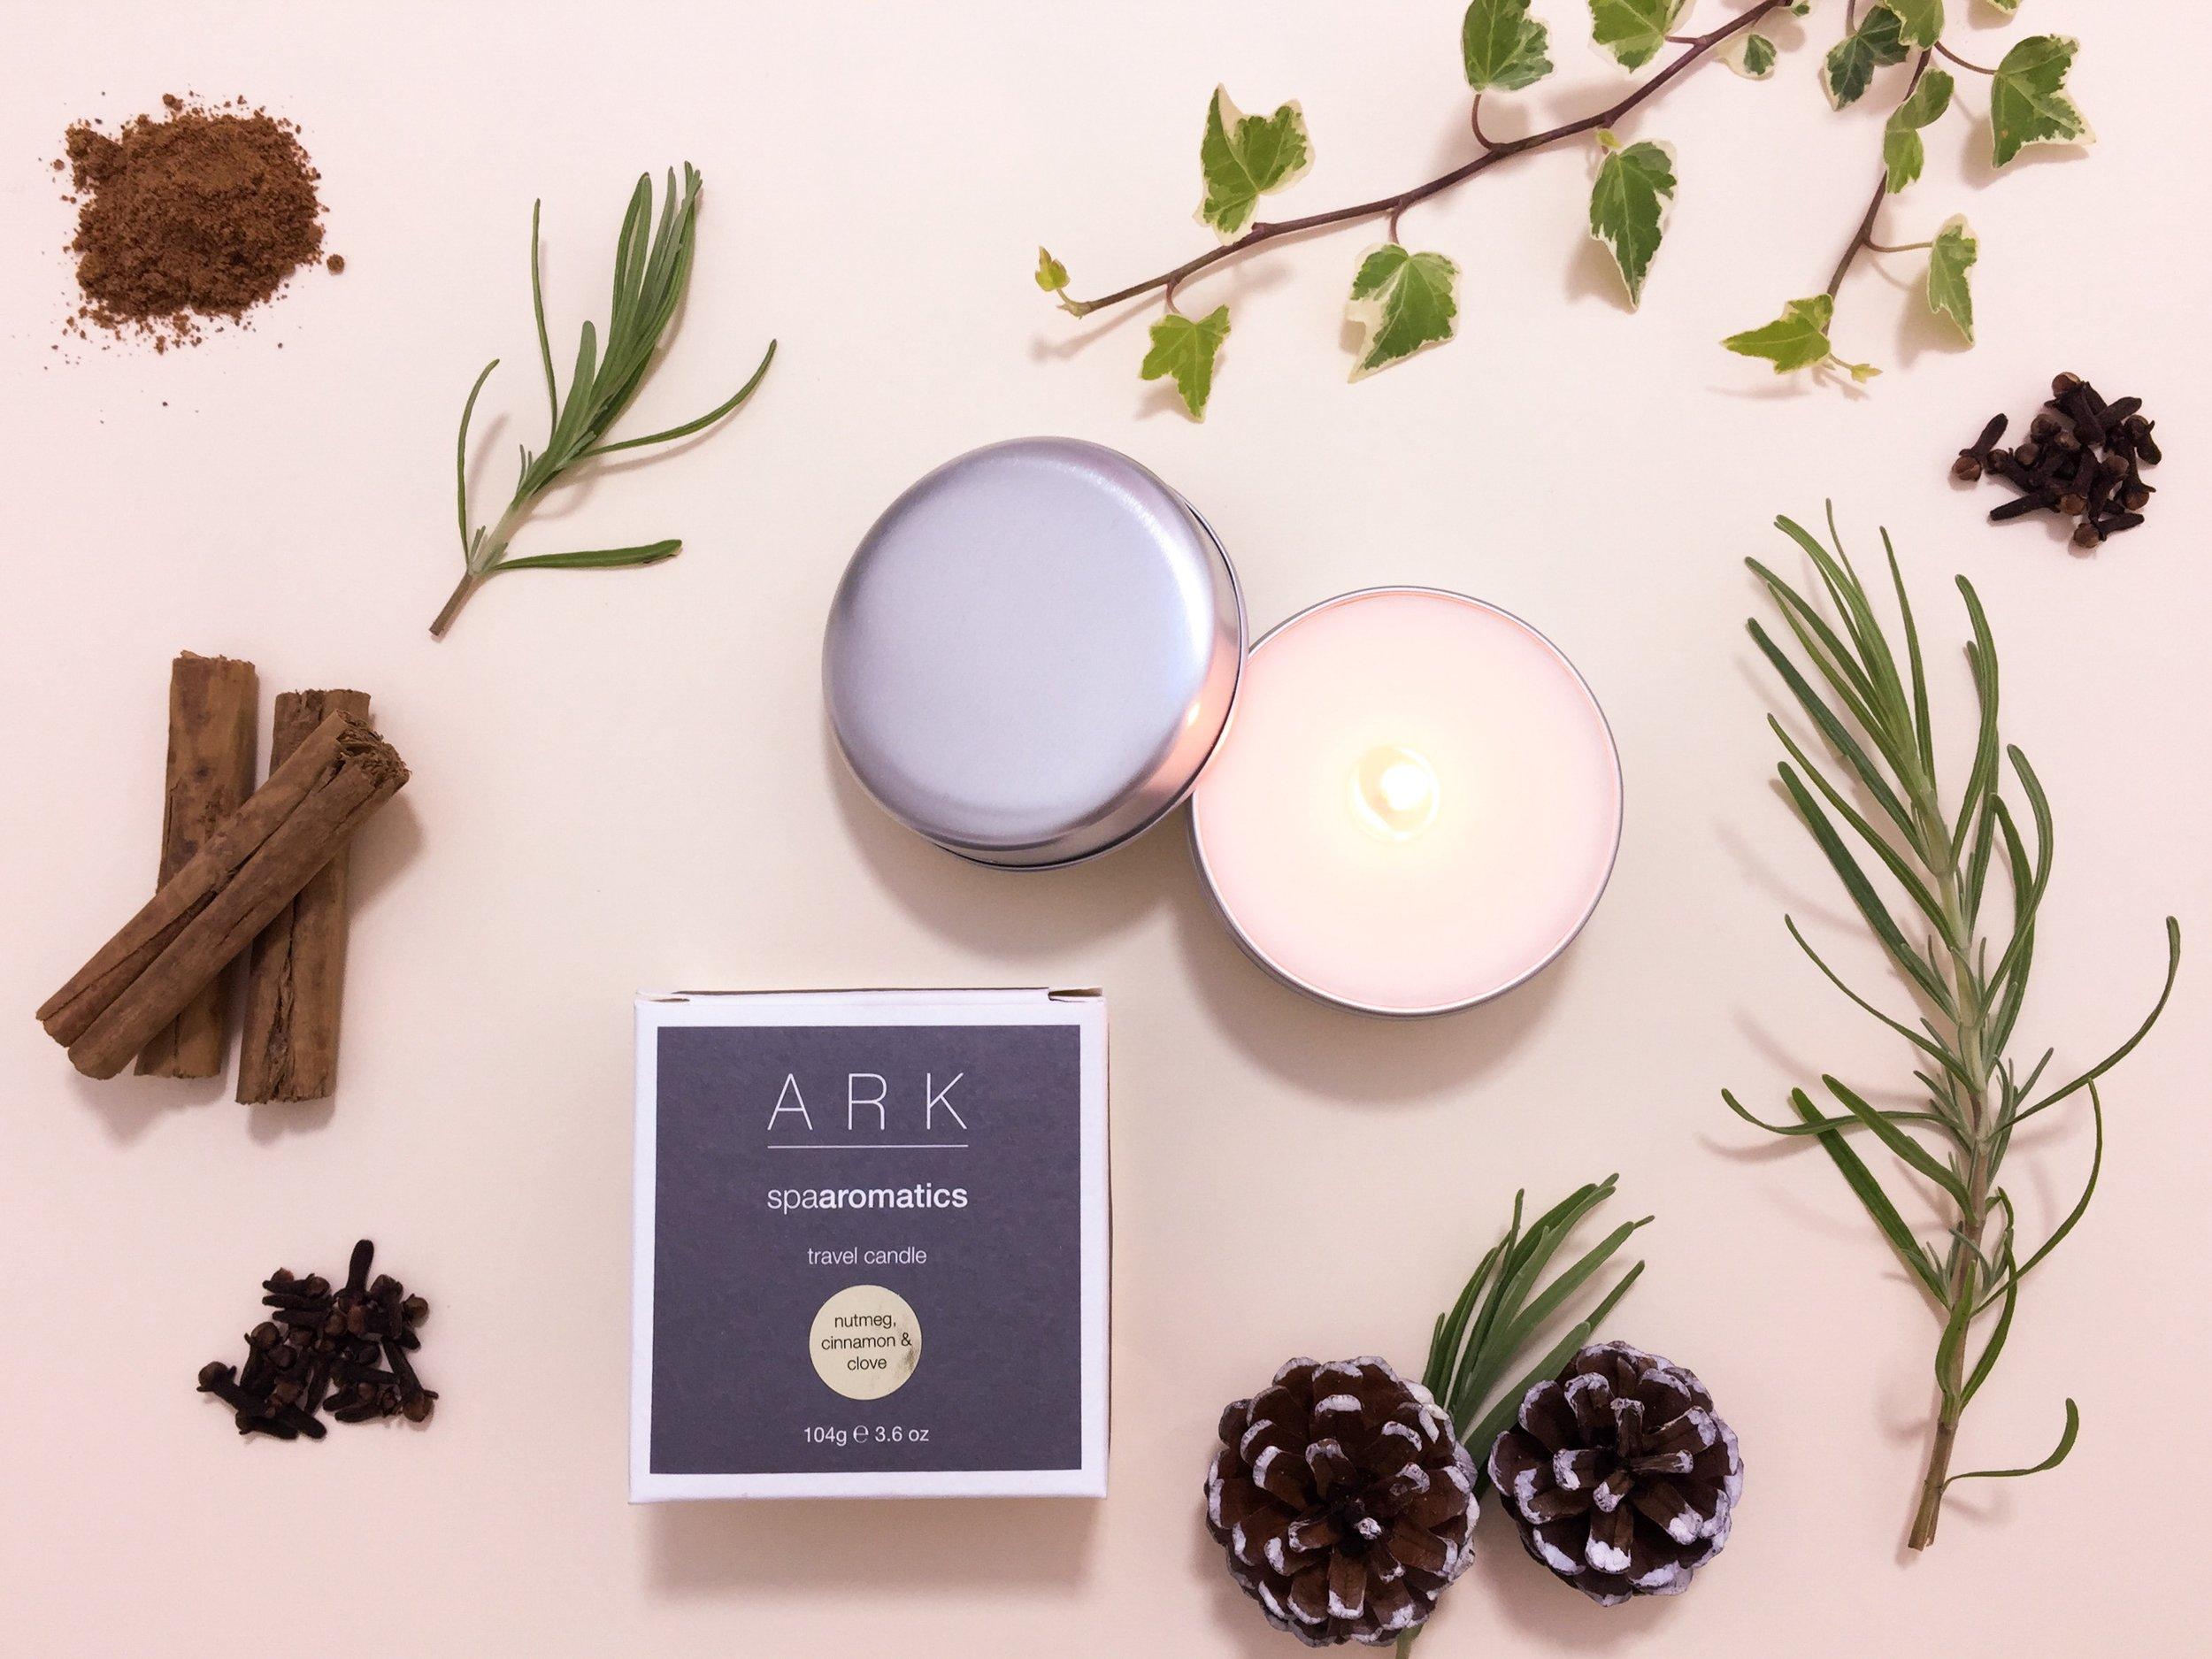 ARK Christmas Candle 1 copy.JPG